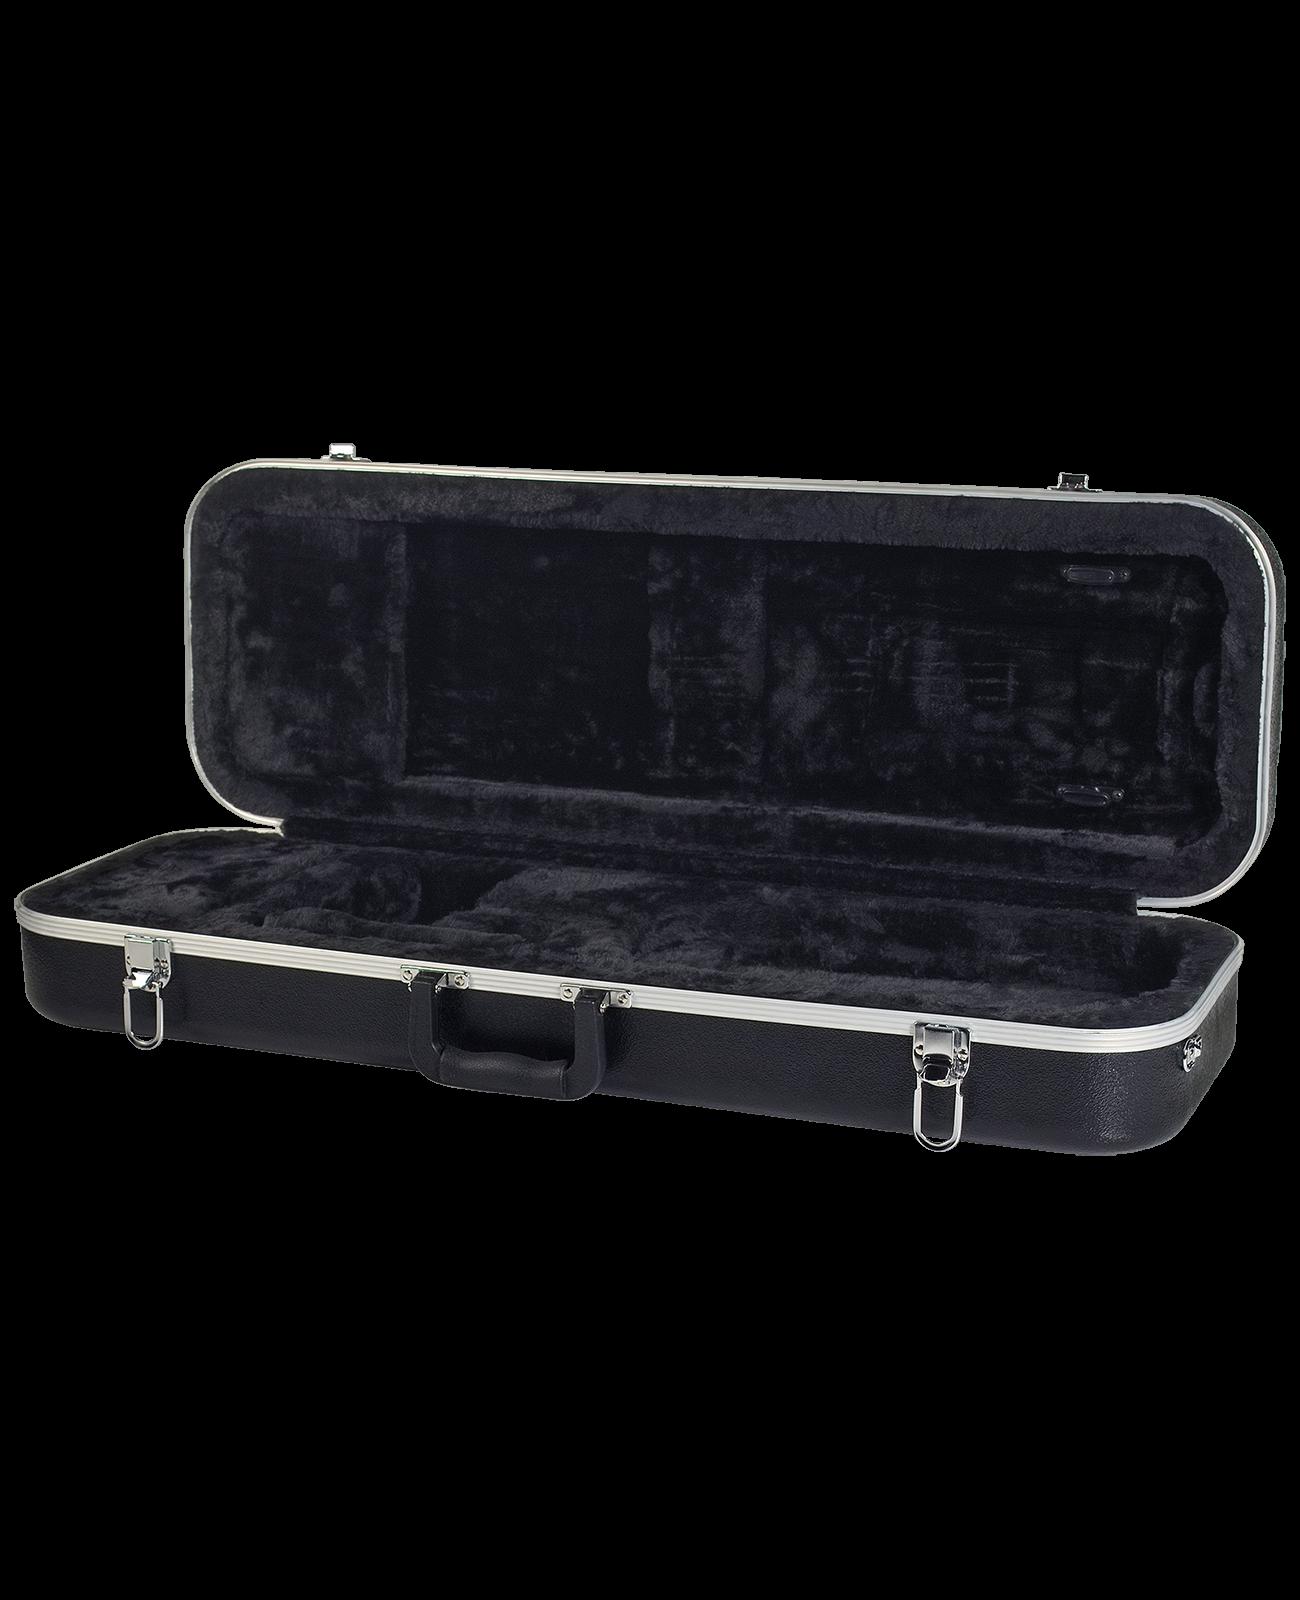 Golden Gate CP-3910 Violin Case, Oblong, 4/4 Size